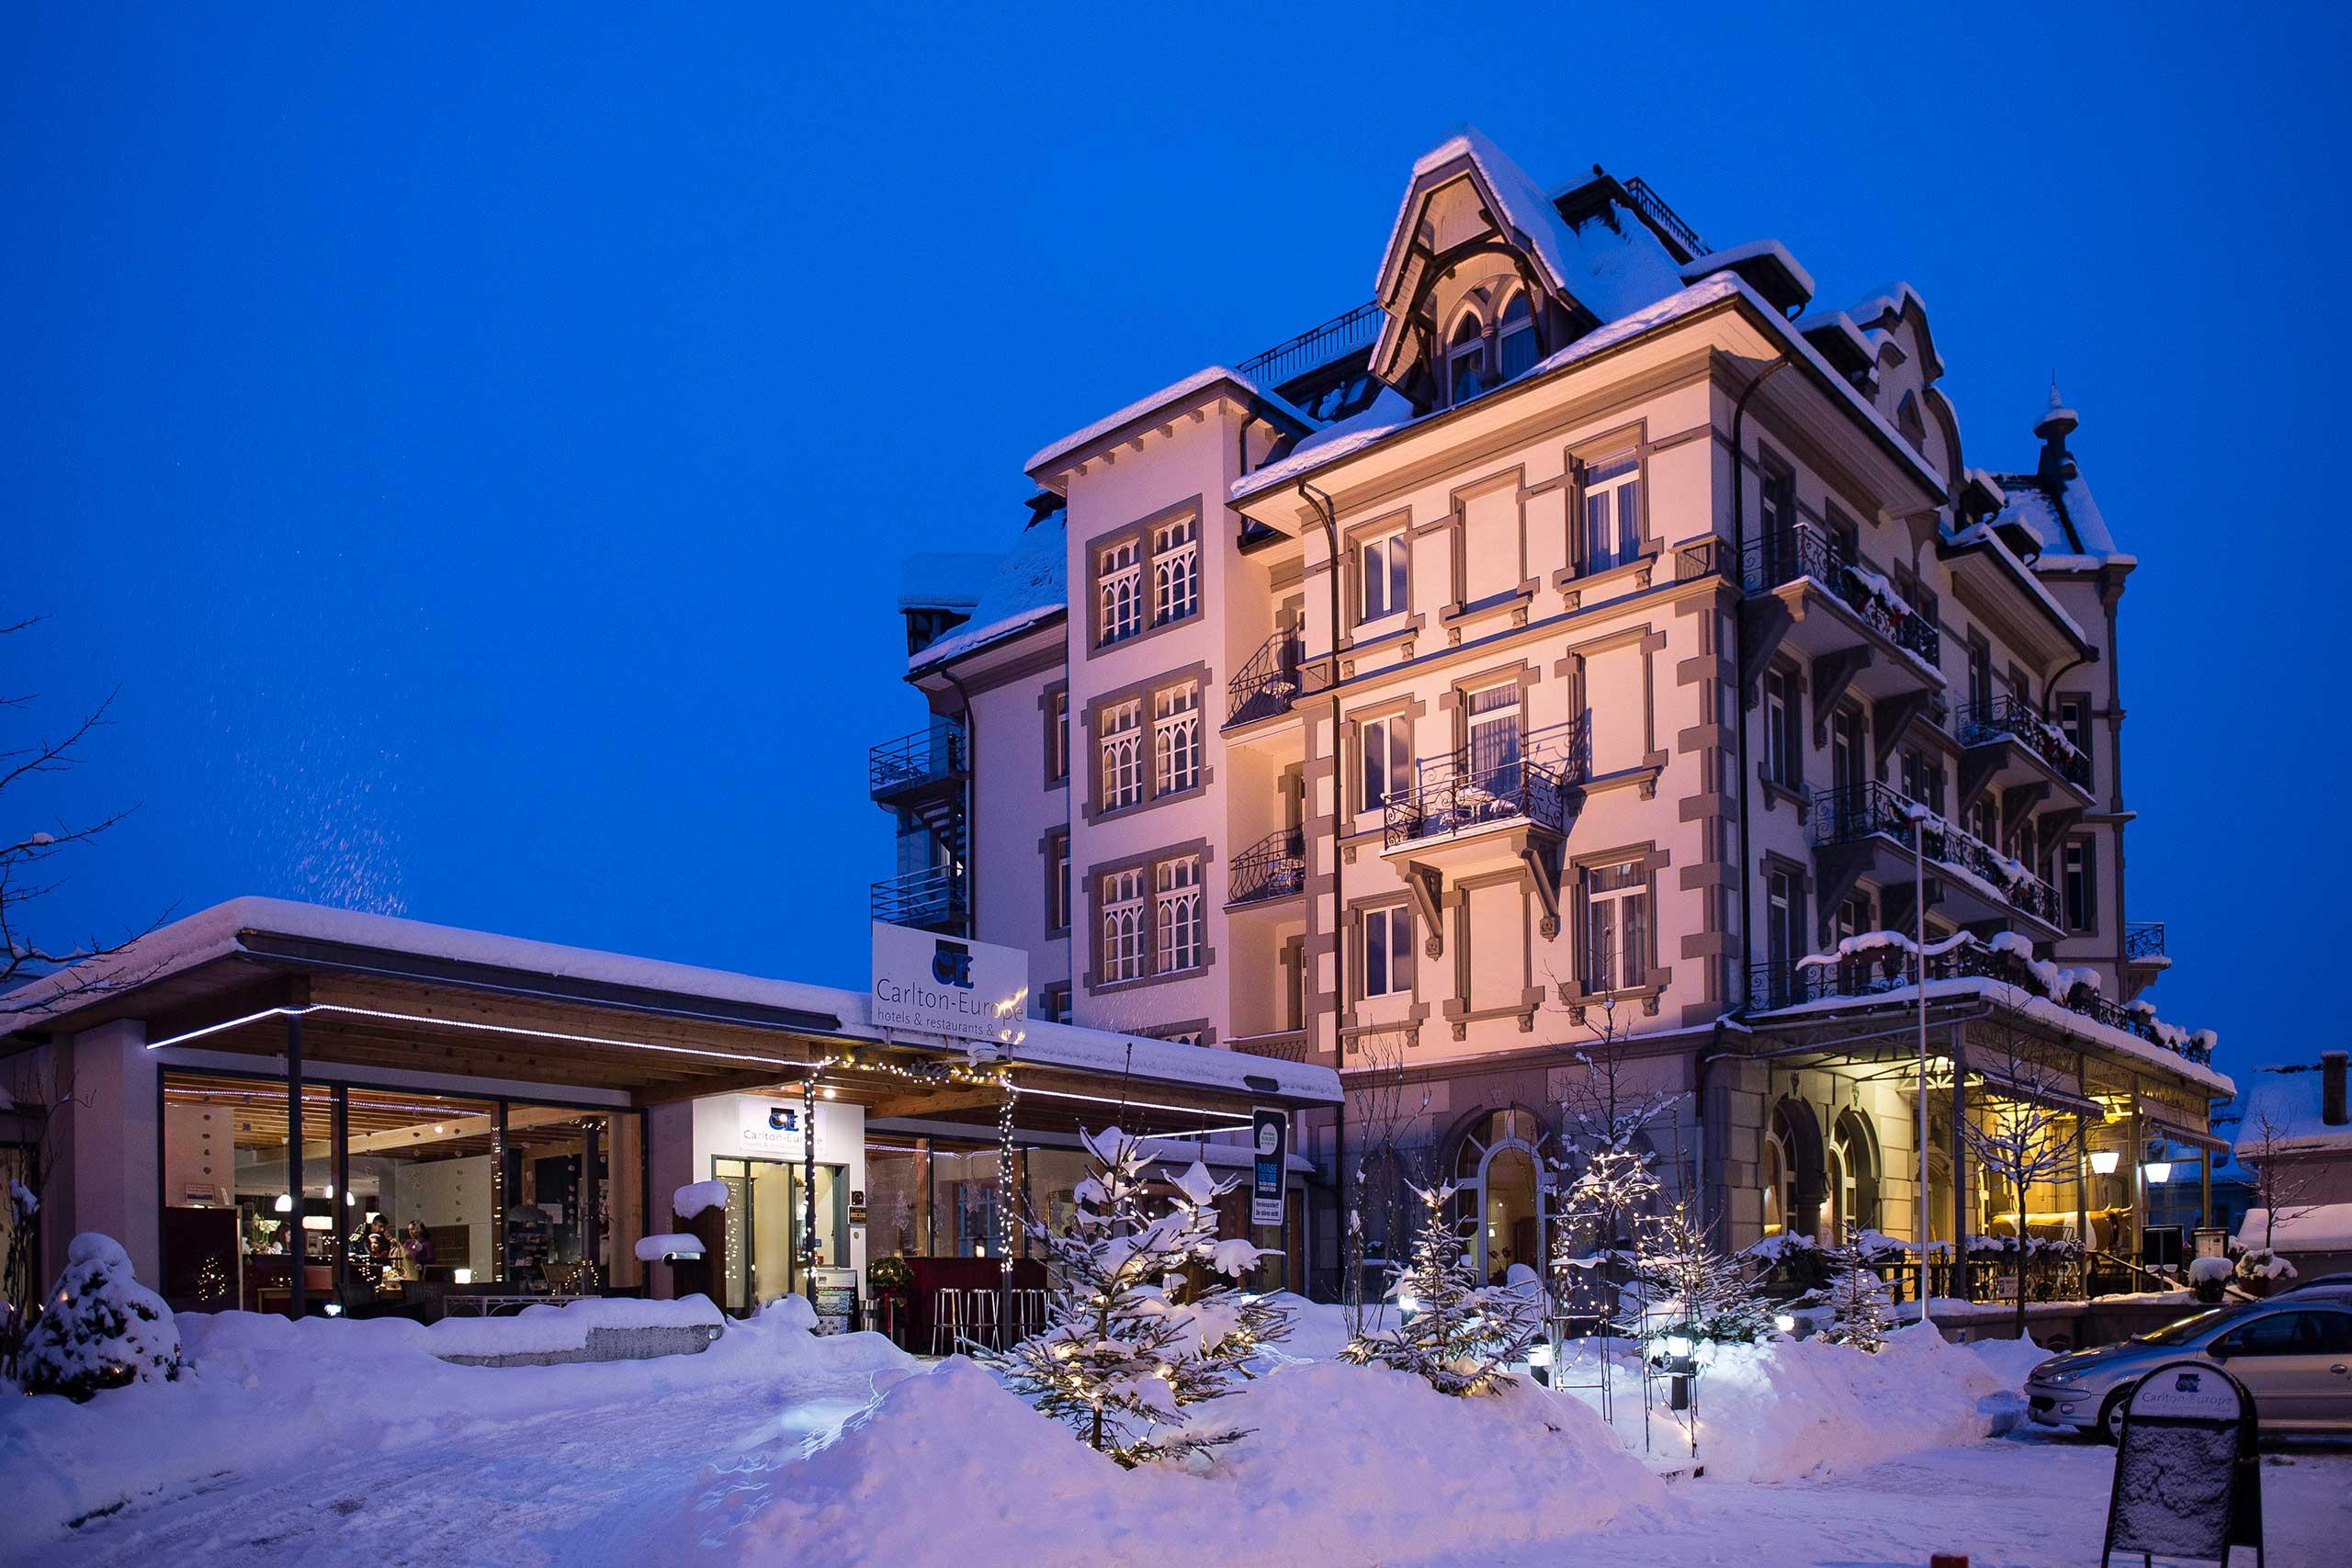 carlton-europe-front-winter-schnee-gebaeude.jpg